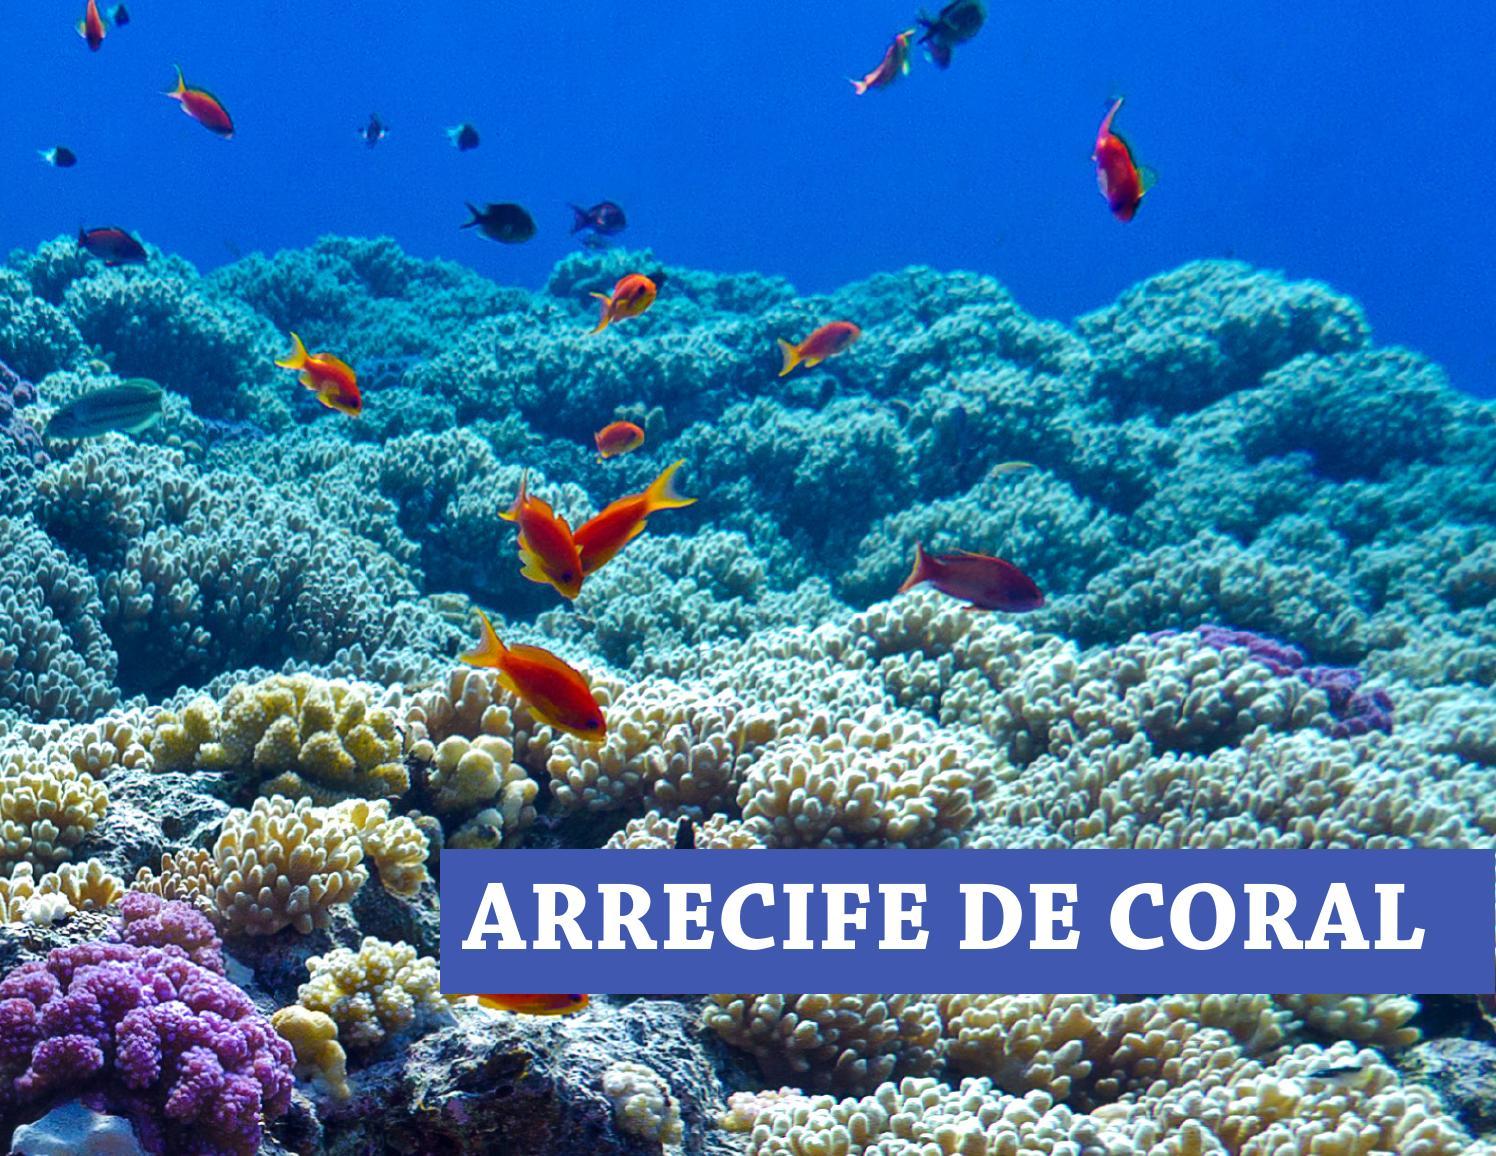 ARRECIFE DE CORAL by Harumy Herrera - issuu